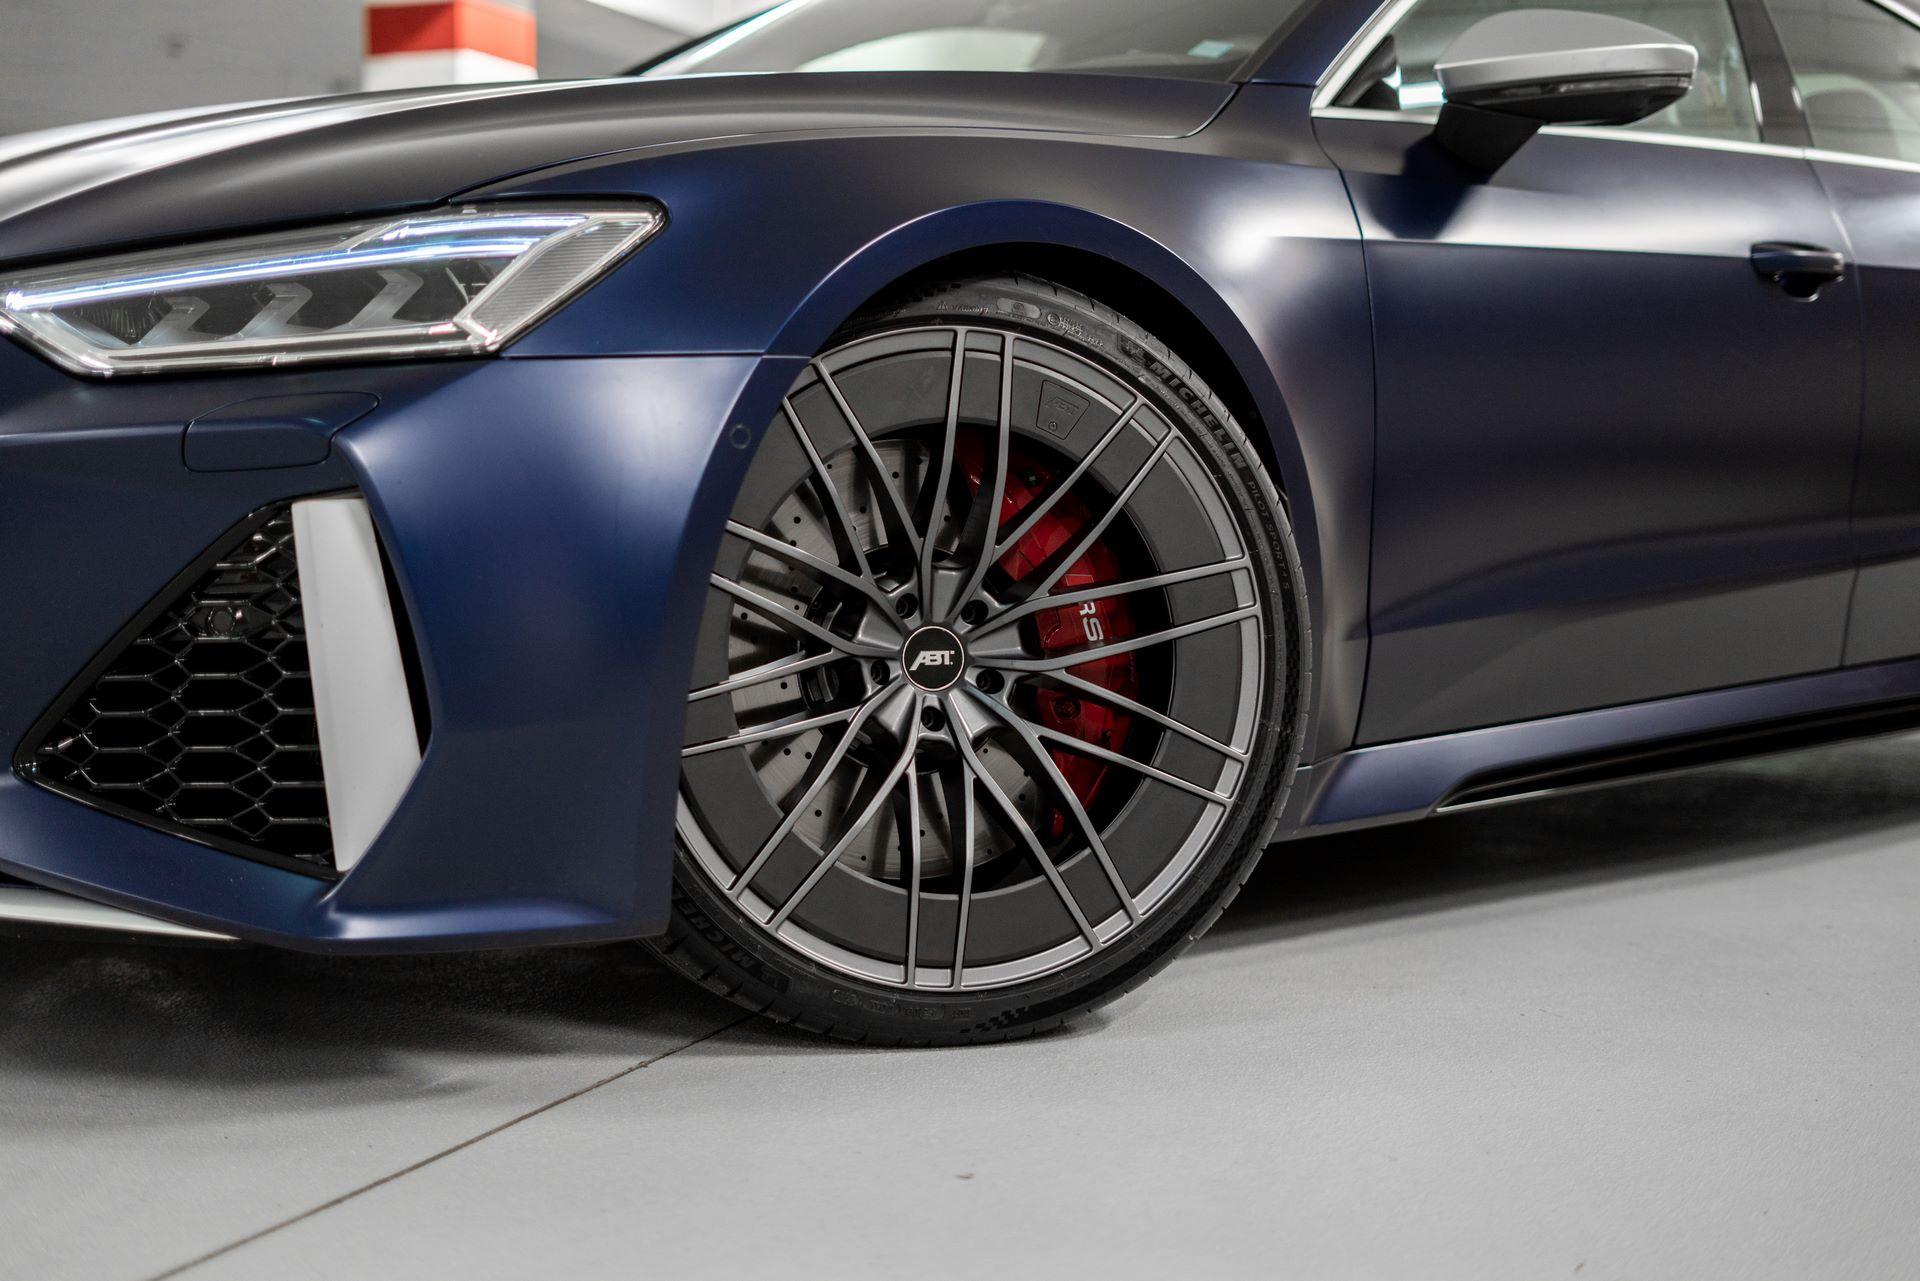 ABT_RS7_blue_front_diagonally_depot_HR_aero_wheel